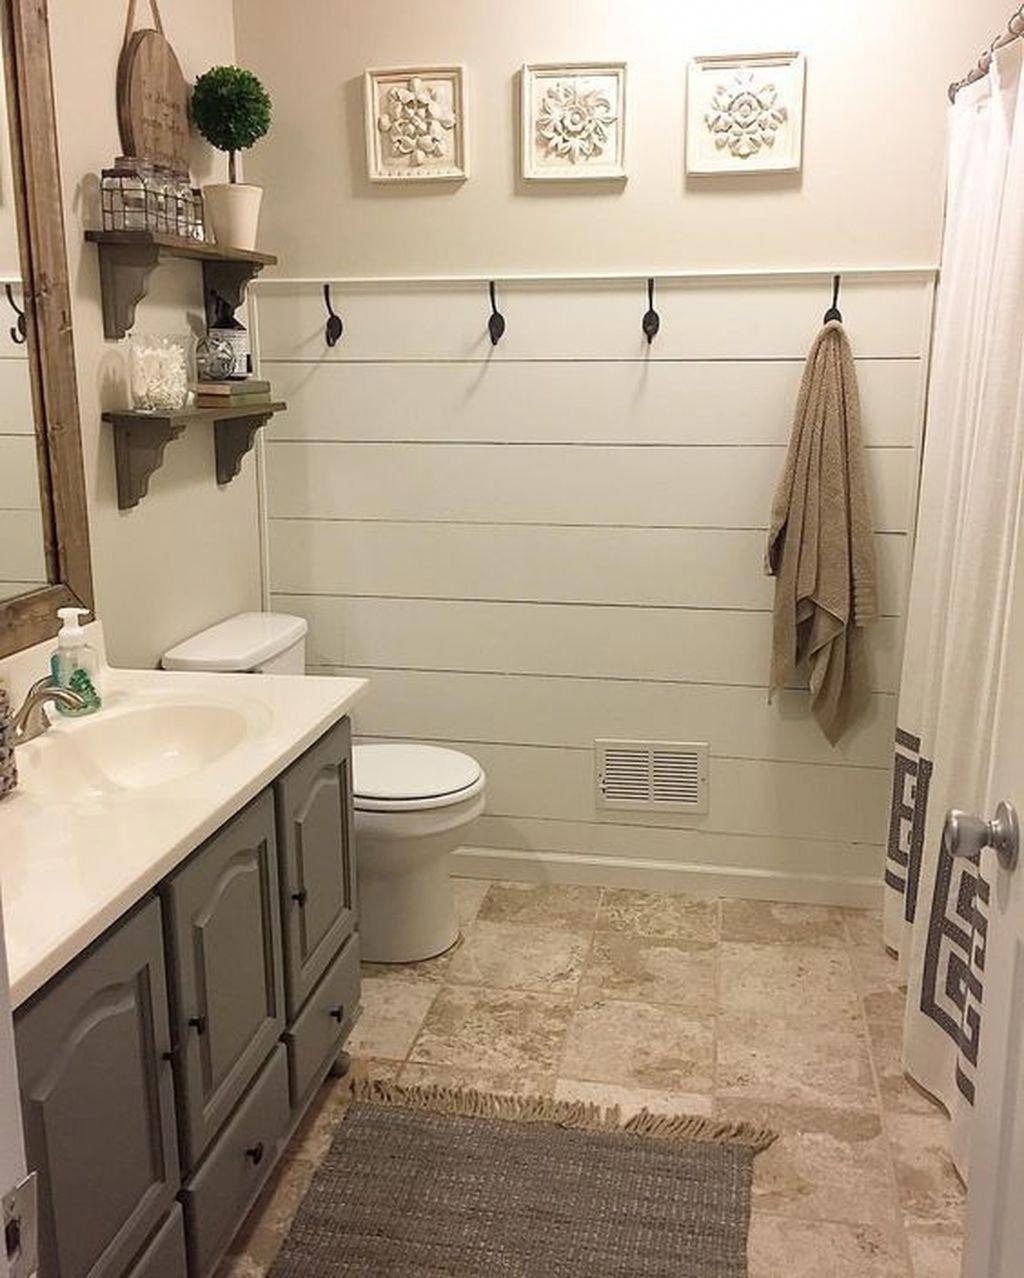 Decorating Bathrooms With No Windows Decoratingbathrooms Bathroom Decor Bathroom Makeover Modern Farmhouse Bathroom